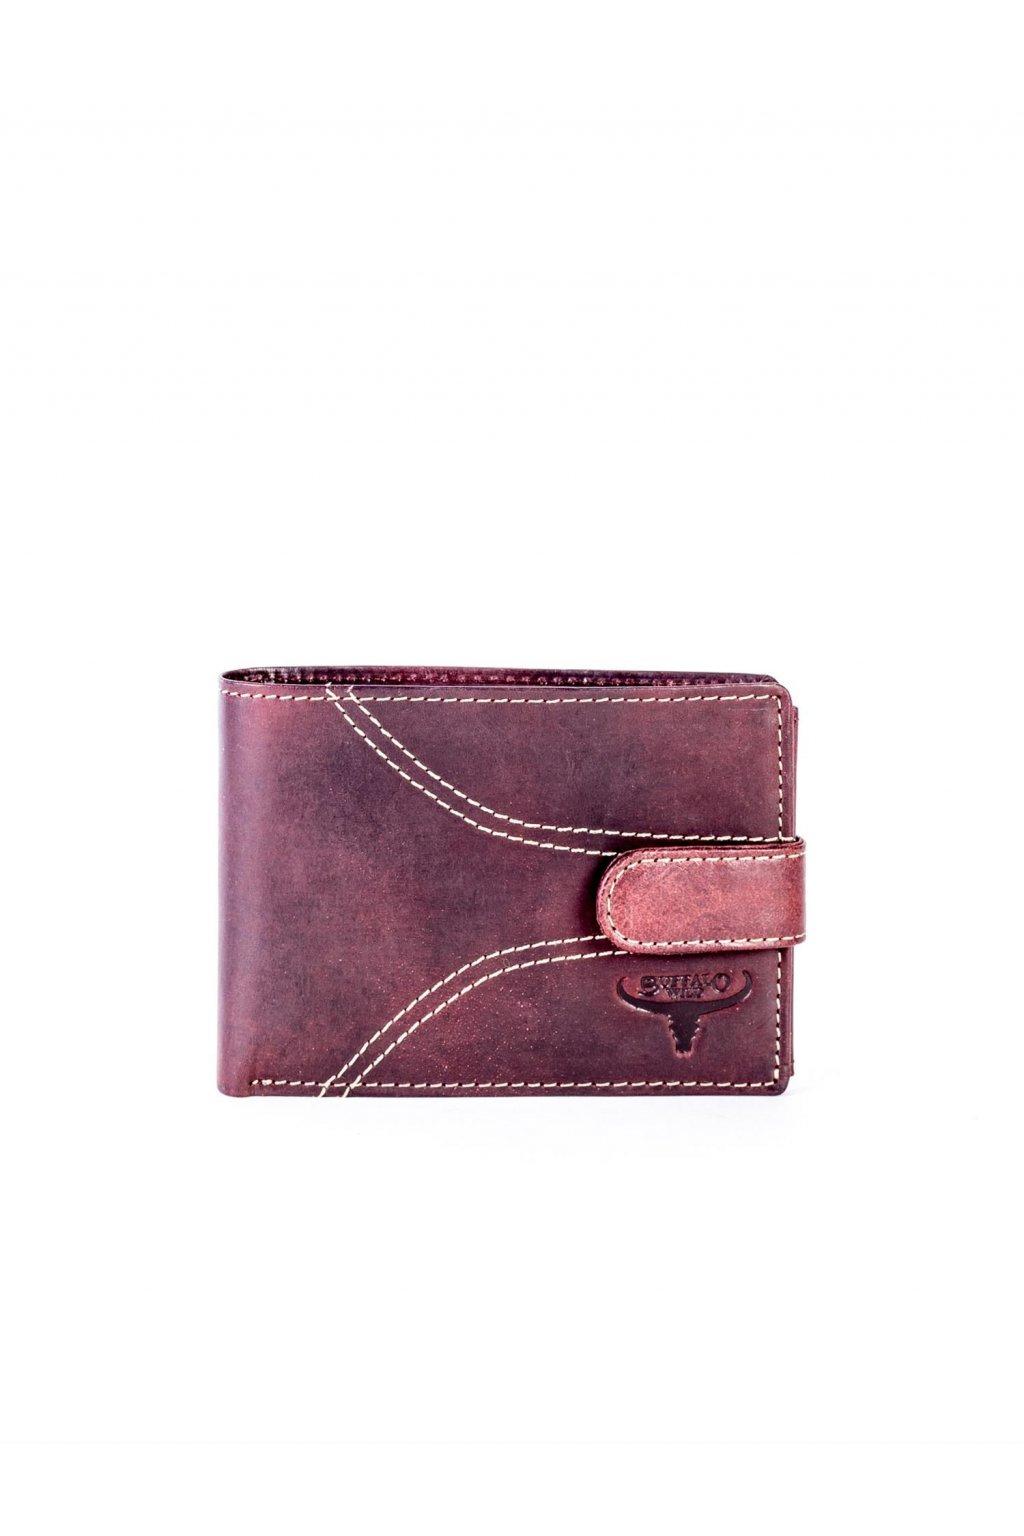 Pánska peňaženka kód CE-PR-N992L-HP-4.95